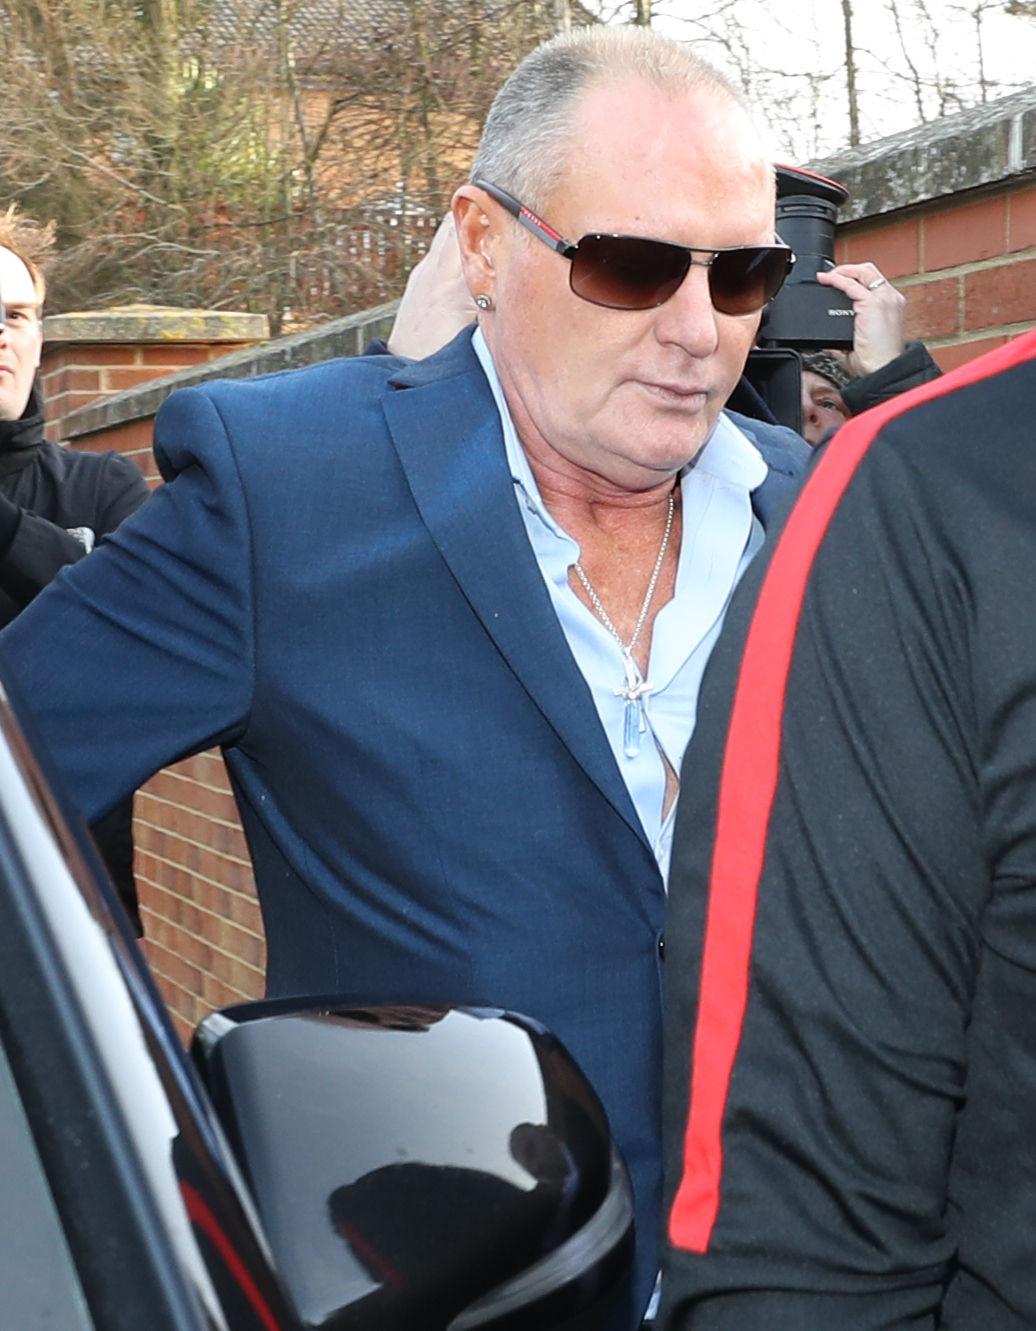 Paul Gascoigne denies the attack on a woman in Darlington